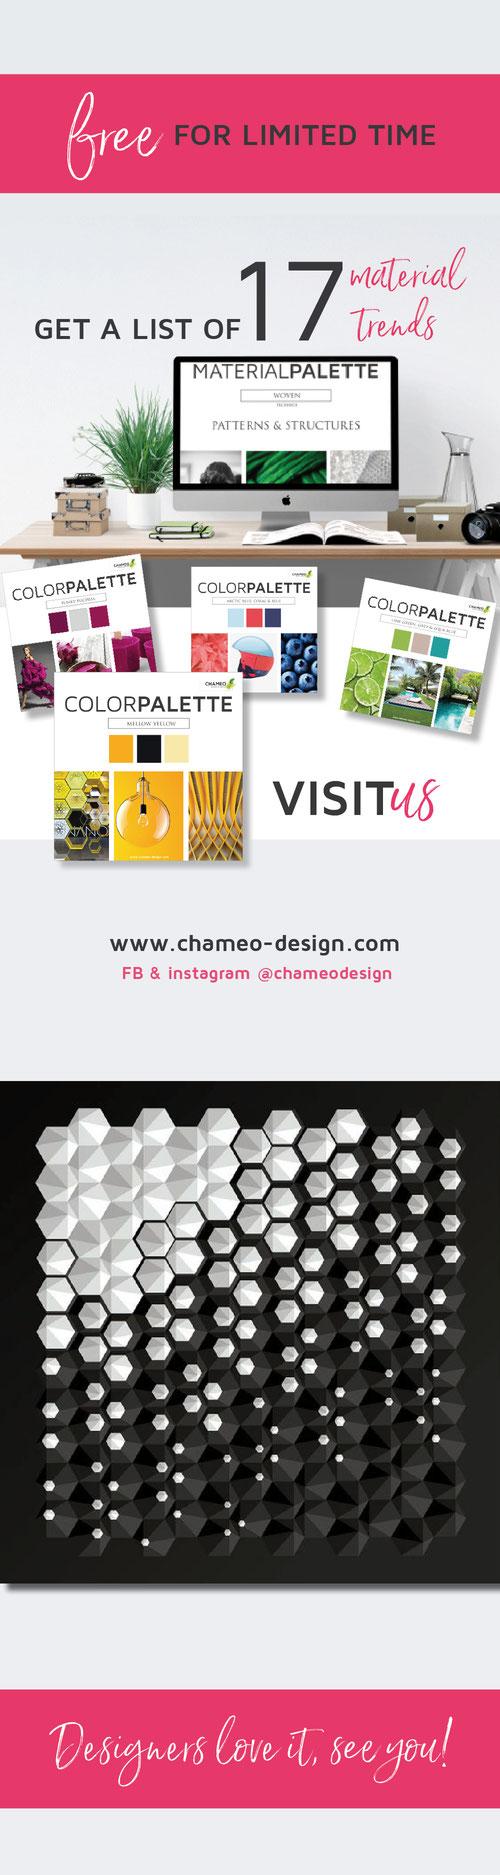 Get a list of 16 material design trends - visit follow @chameodesign on pinterest